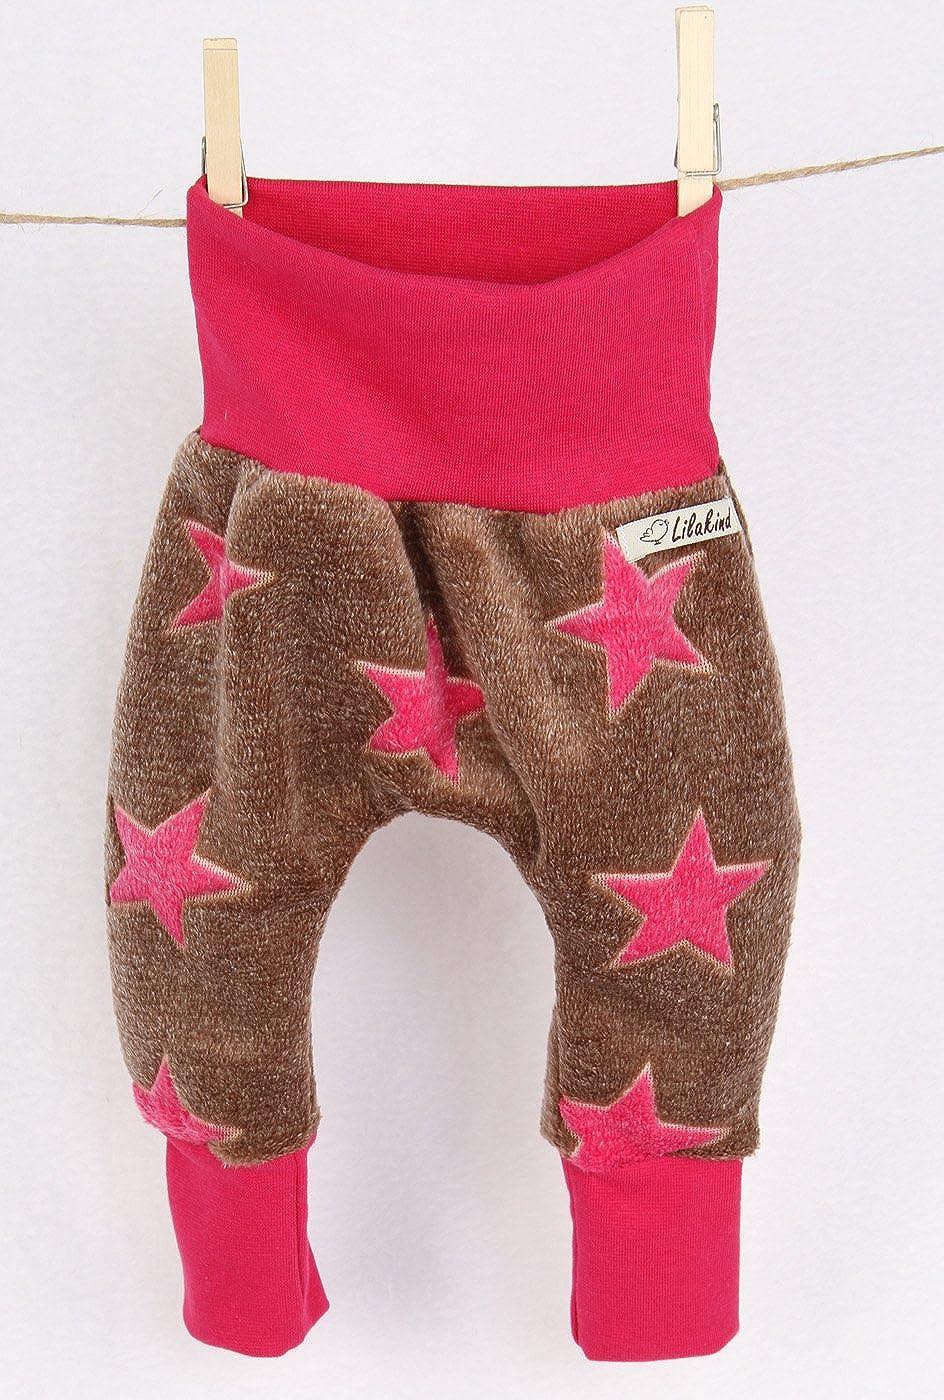 Lilakind Jersey Sweat Pumphose Hose Babyhose Sterne-Hergestellt in Berlin